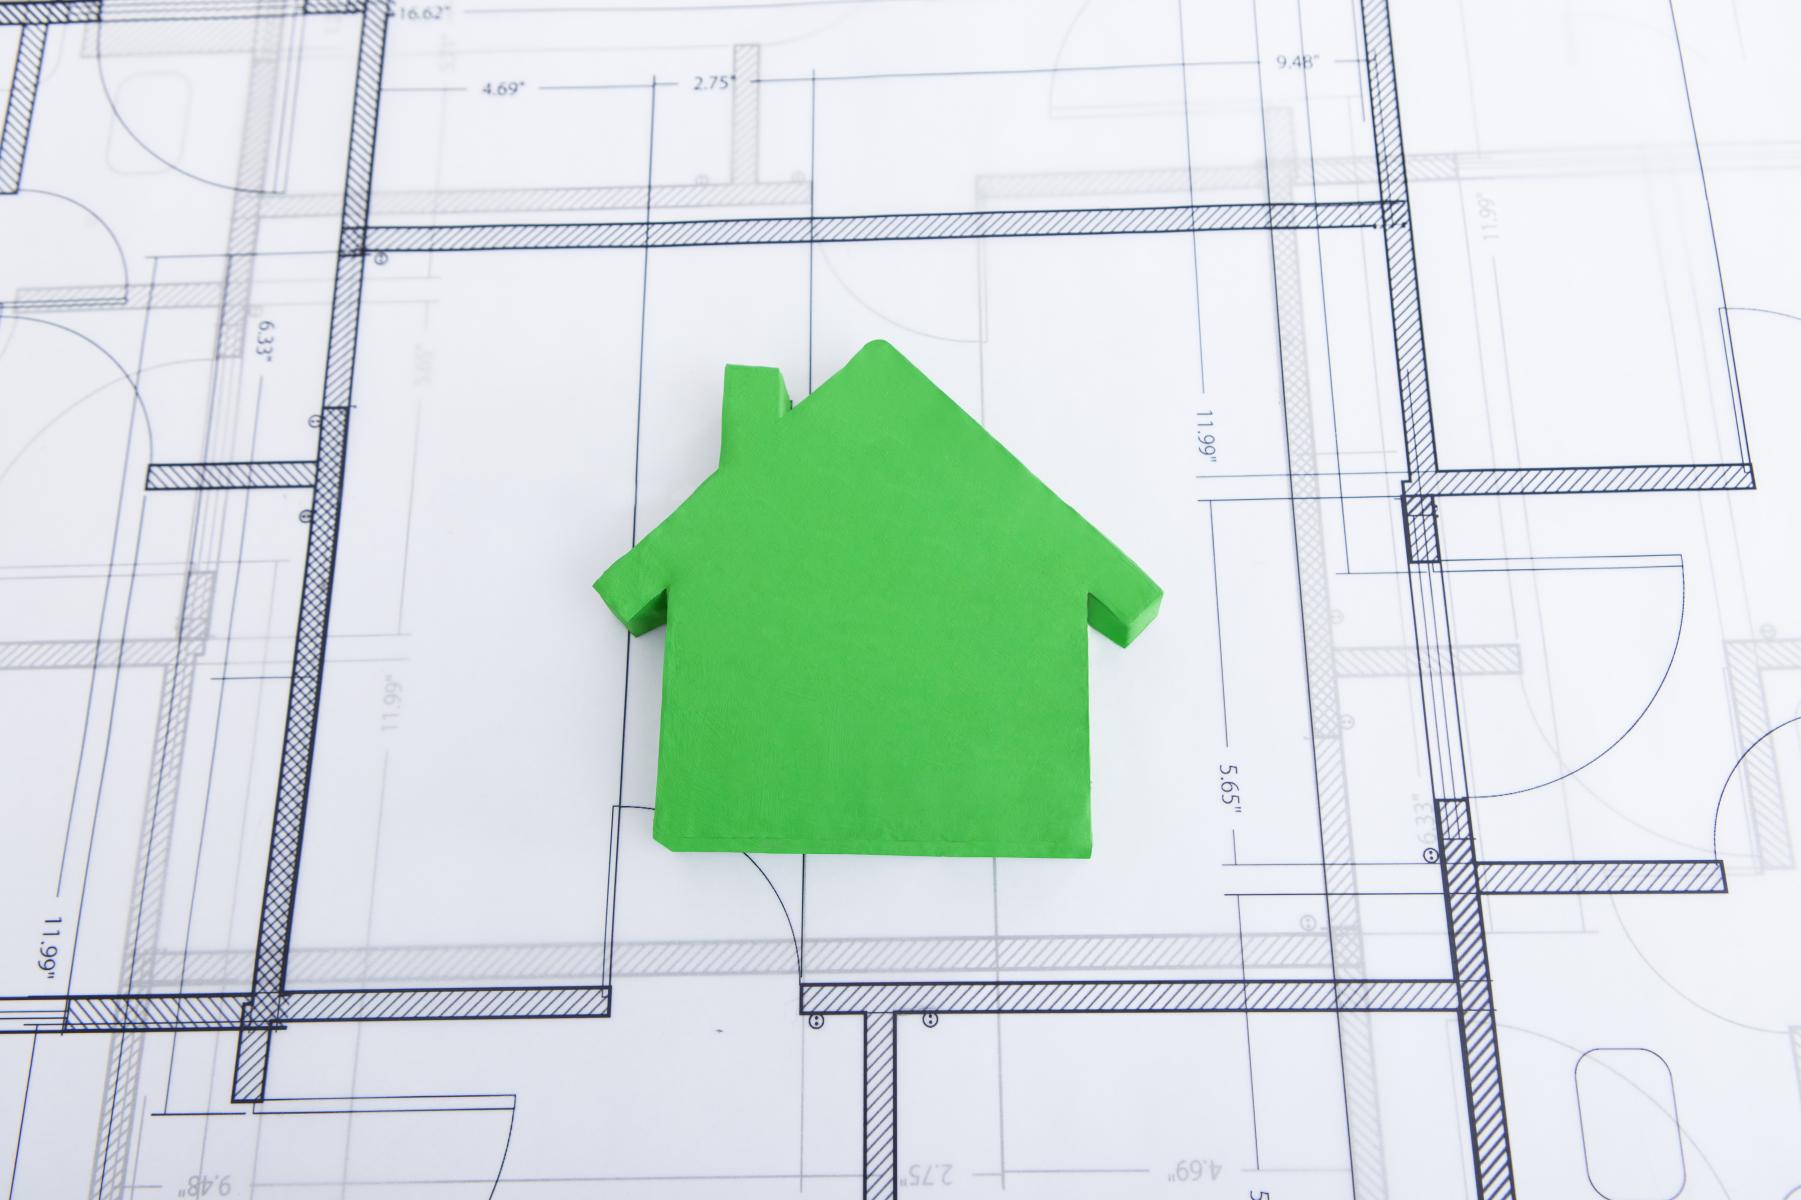 Grønt modellhus oppå planteikning